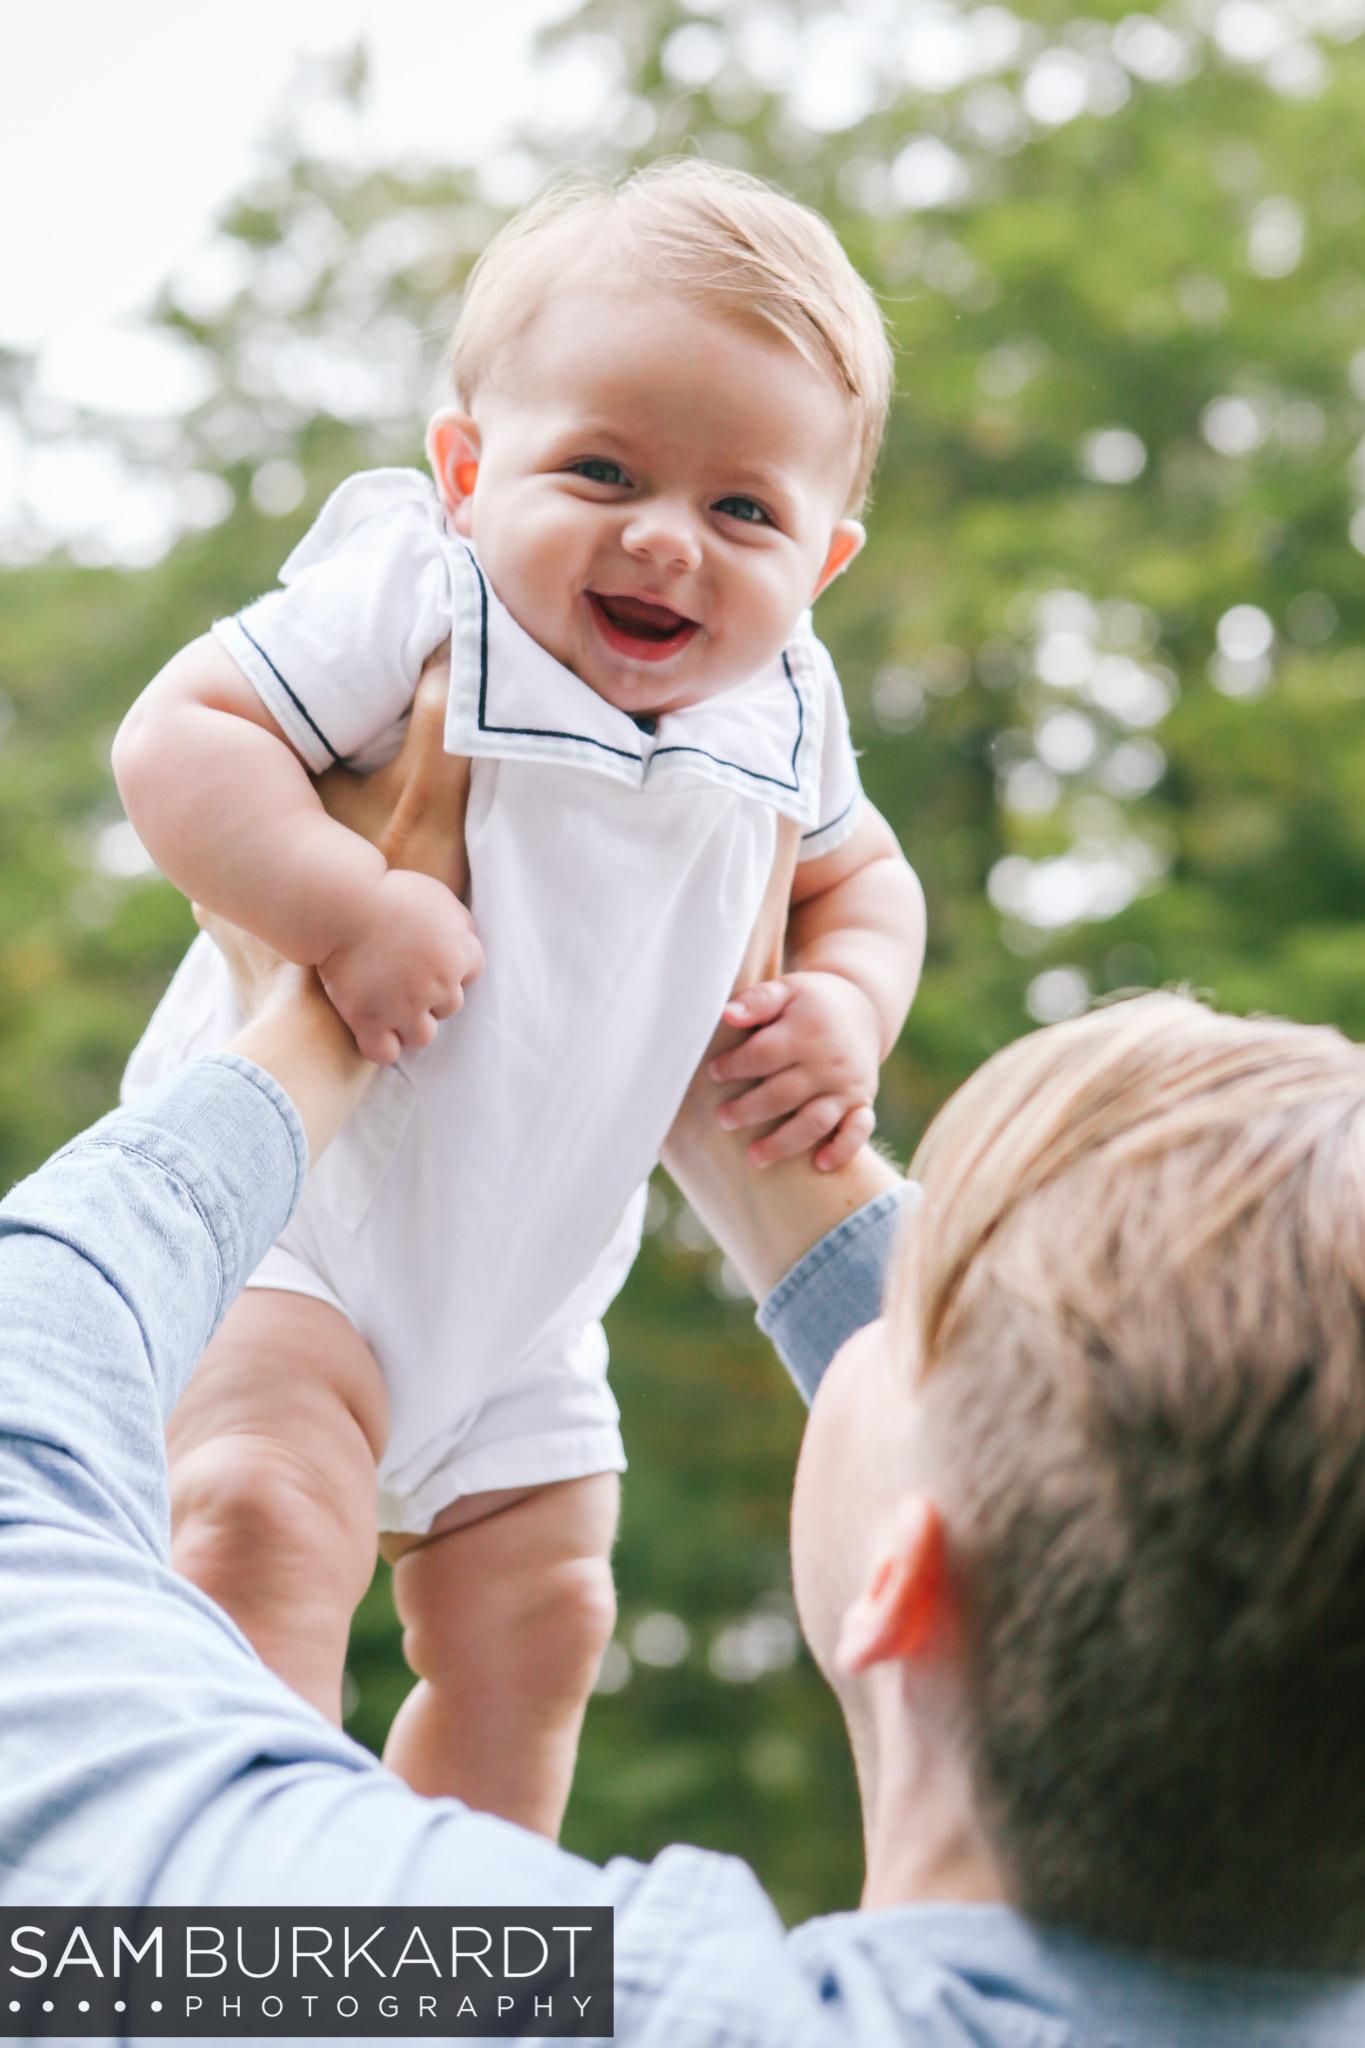 sburkardt_family_photos_fall_portraits_connecticut_washington_016.jpg